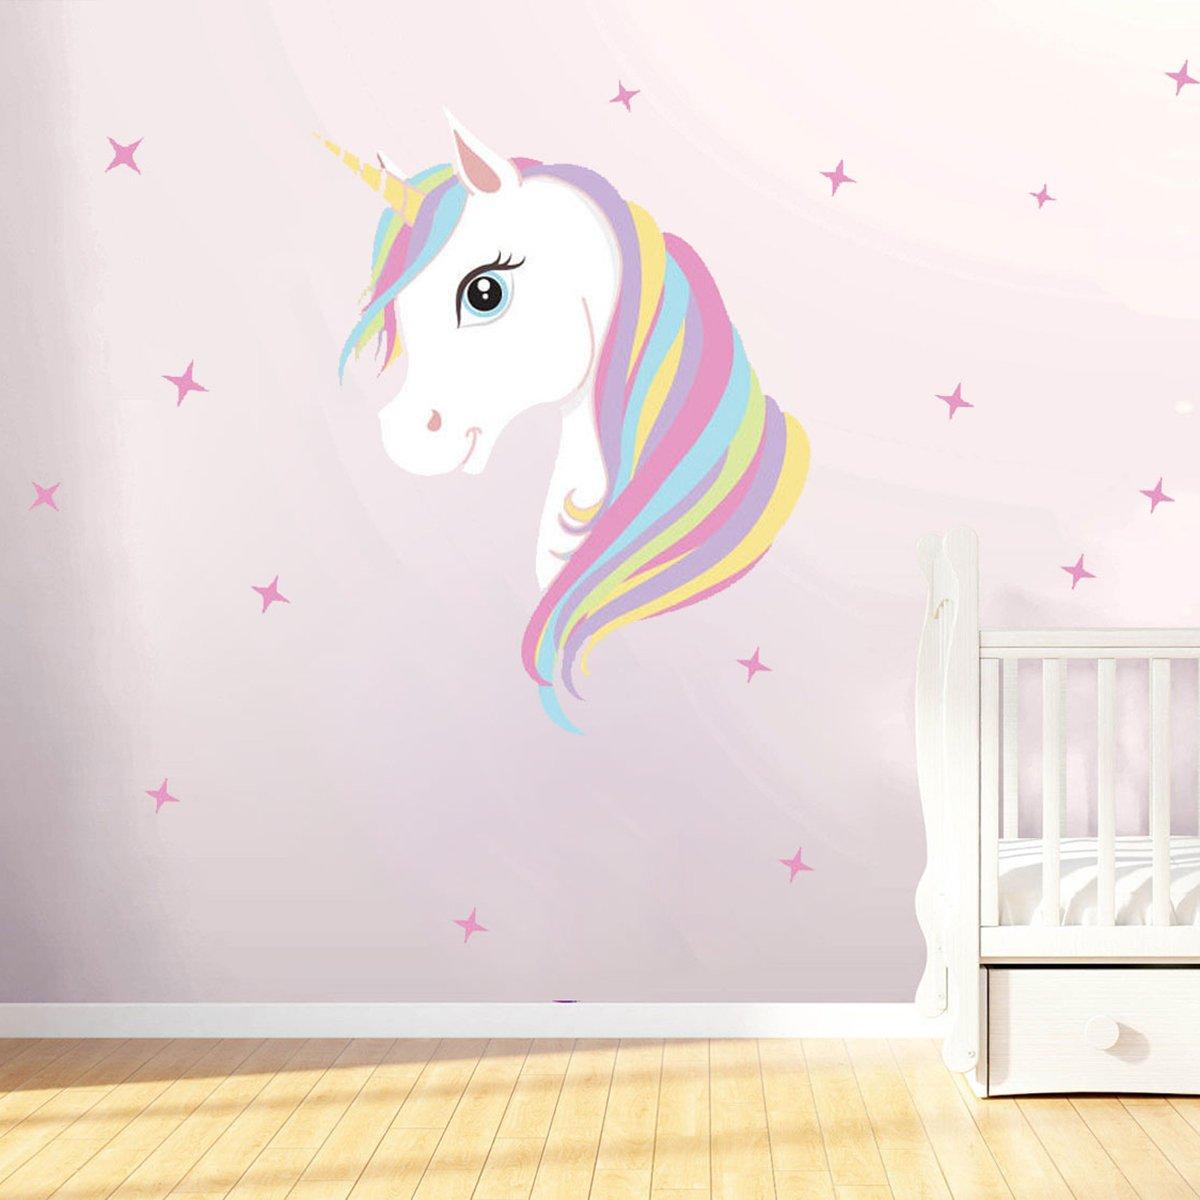 wall decor for girls bedroom – AdamKehoe